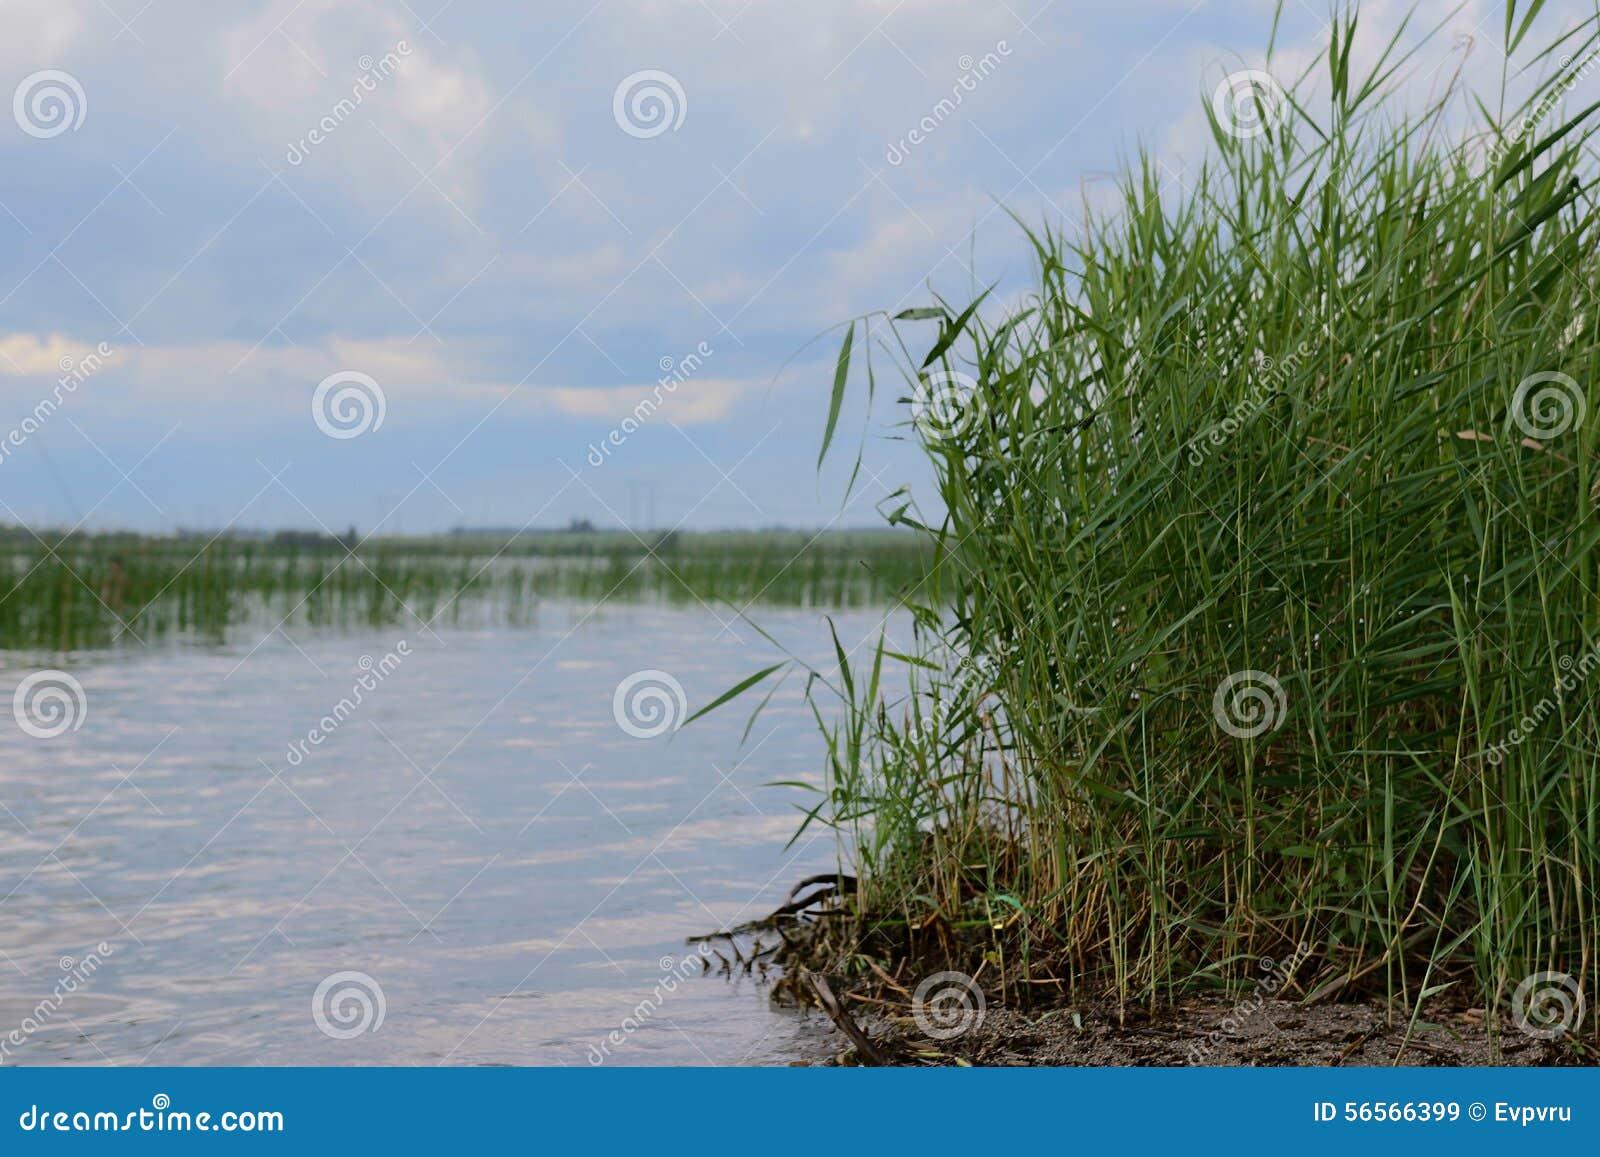 Download κάλαμος στοκ εικόνα. εικόνα από ύδωρ, τοπία, σύννεφο - 56566399